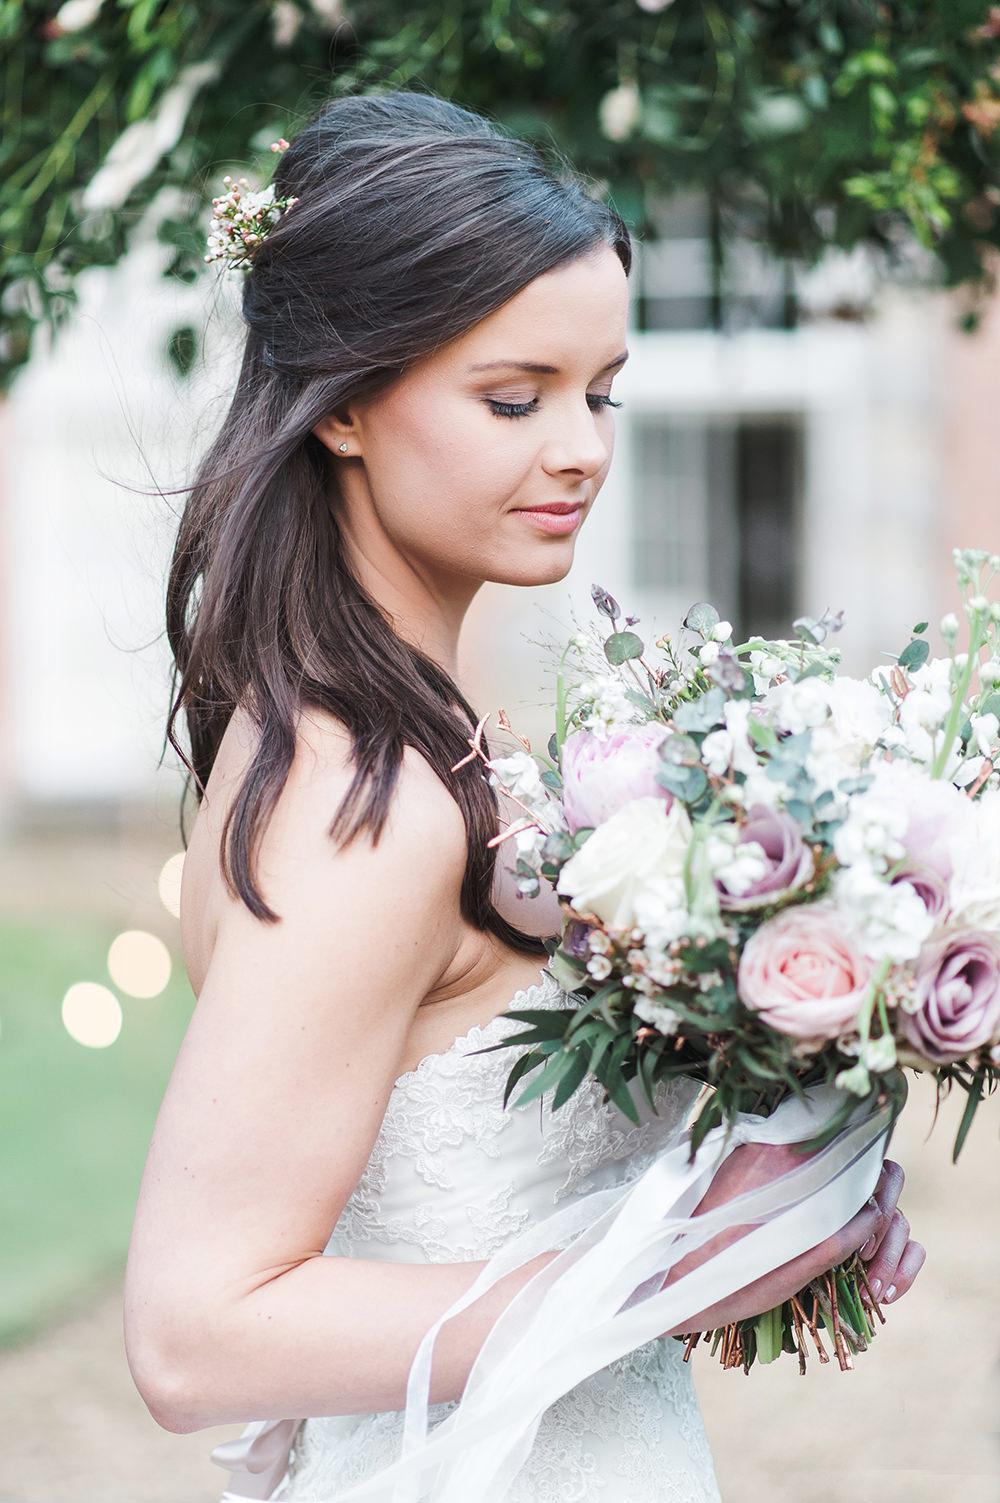 Bride Bridal Gown Dress Strapless Sweetheart Neckline Ribbon Belt Pink Bouquet Rose Peony Ribbon Edmondsham House Wedding Darima Frampton Photography